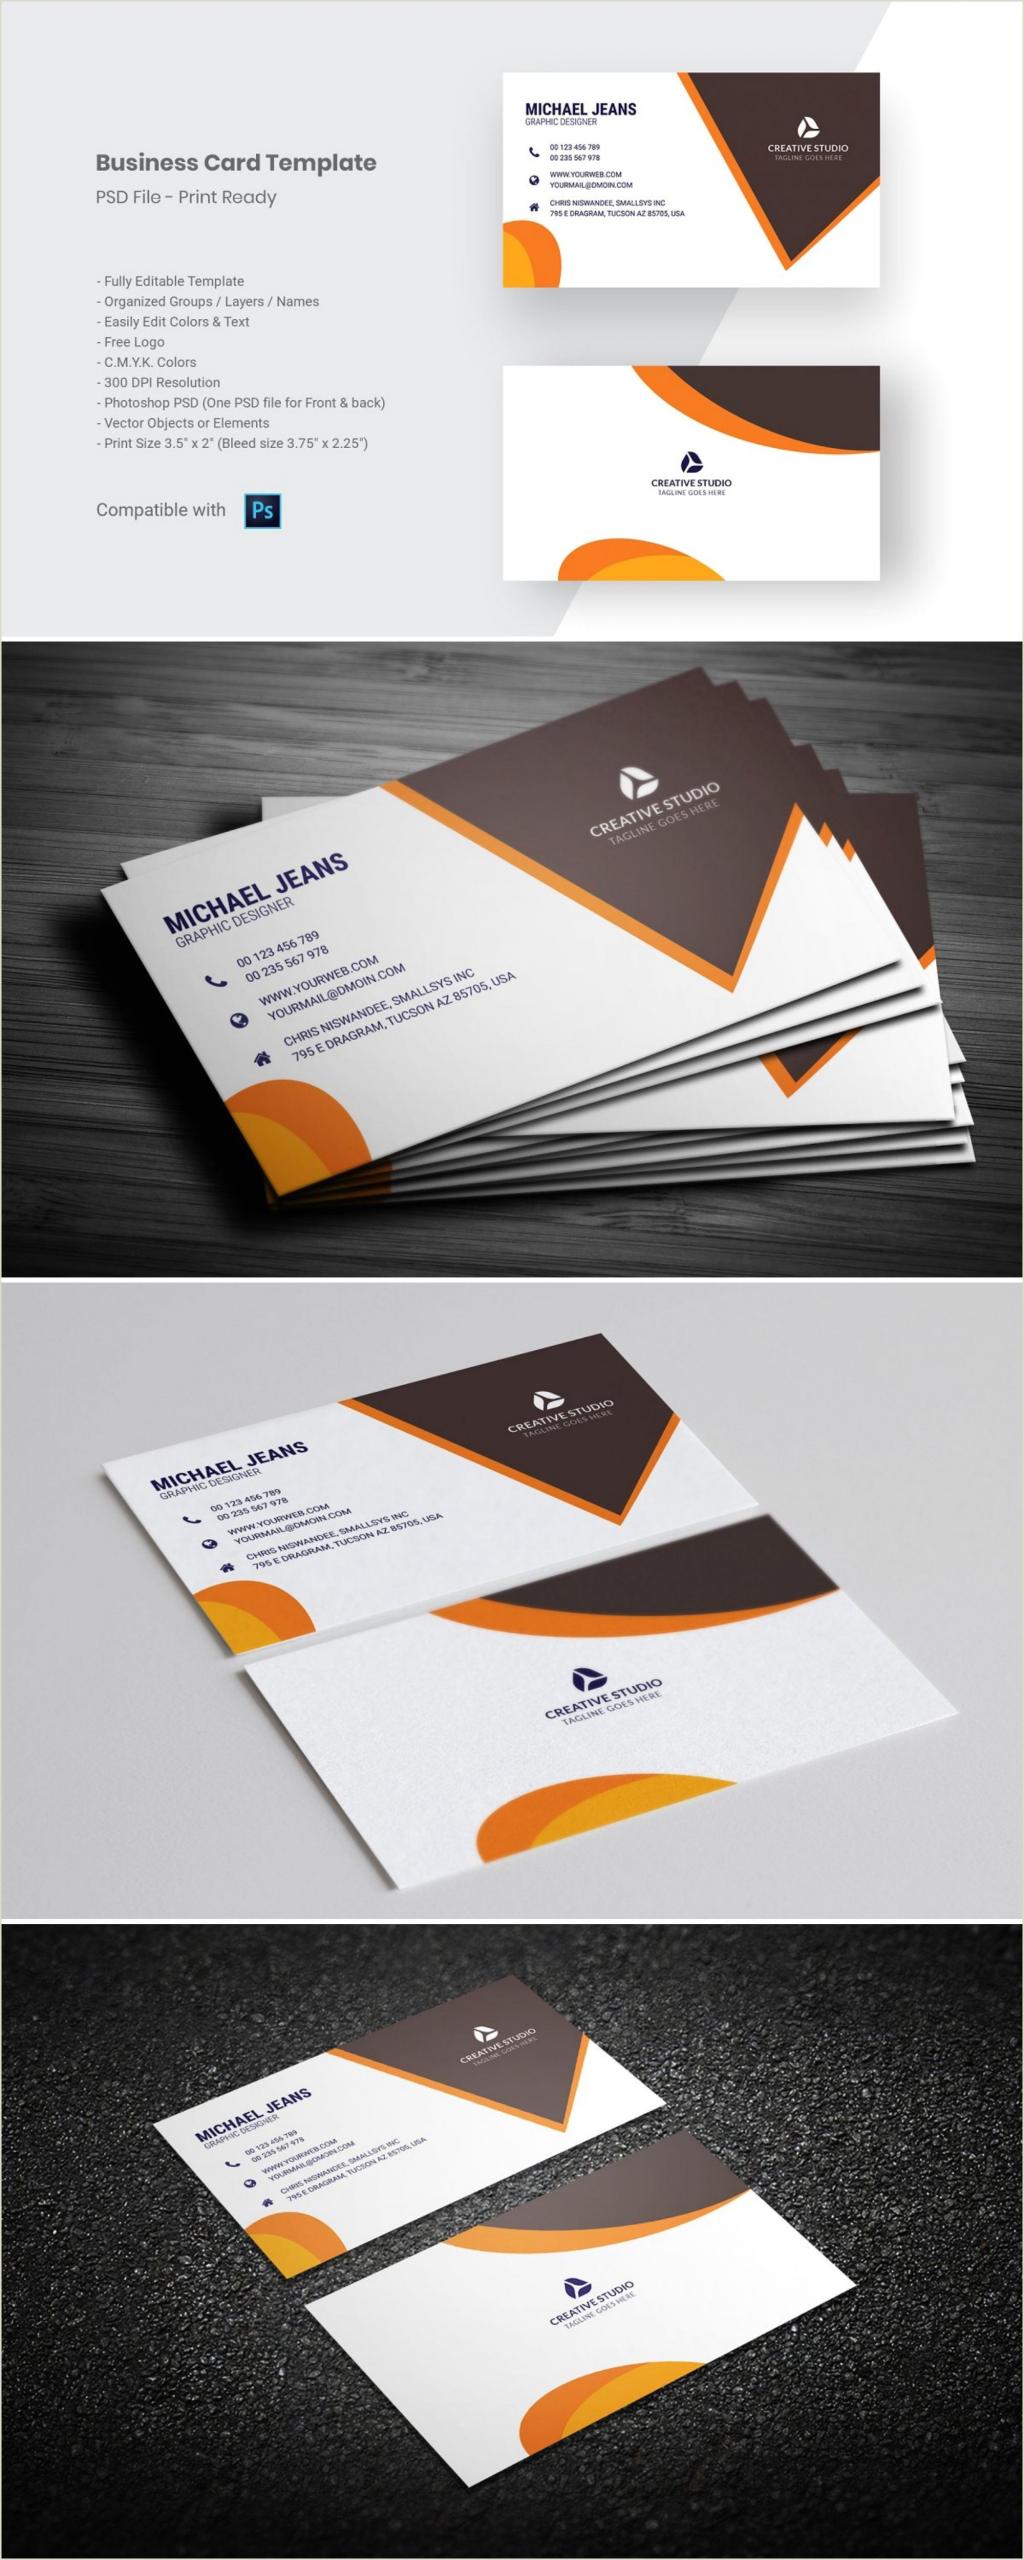 Professional Business Cards Ideas Modern Business Card Template